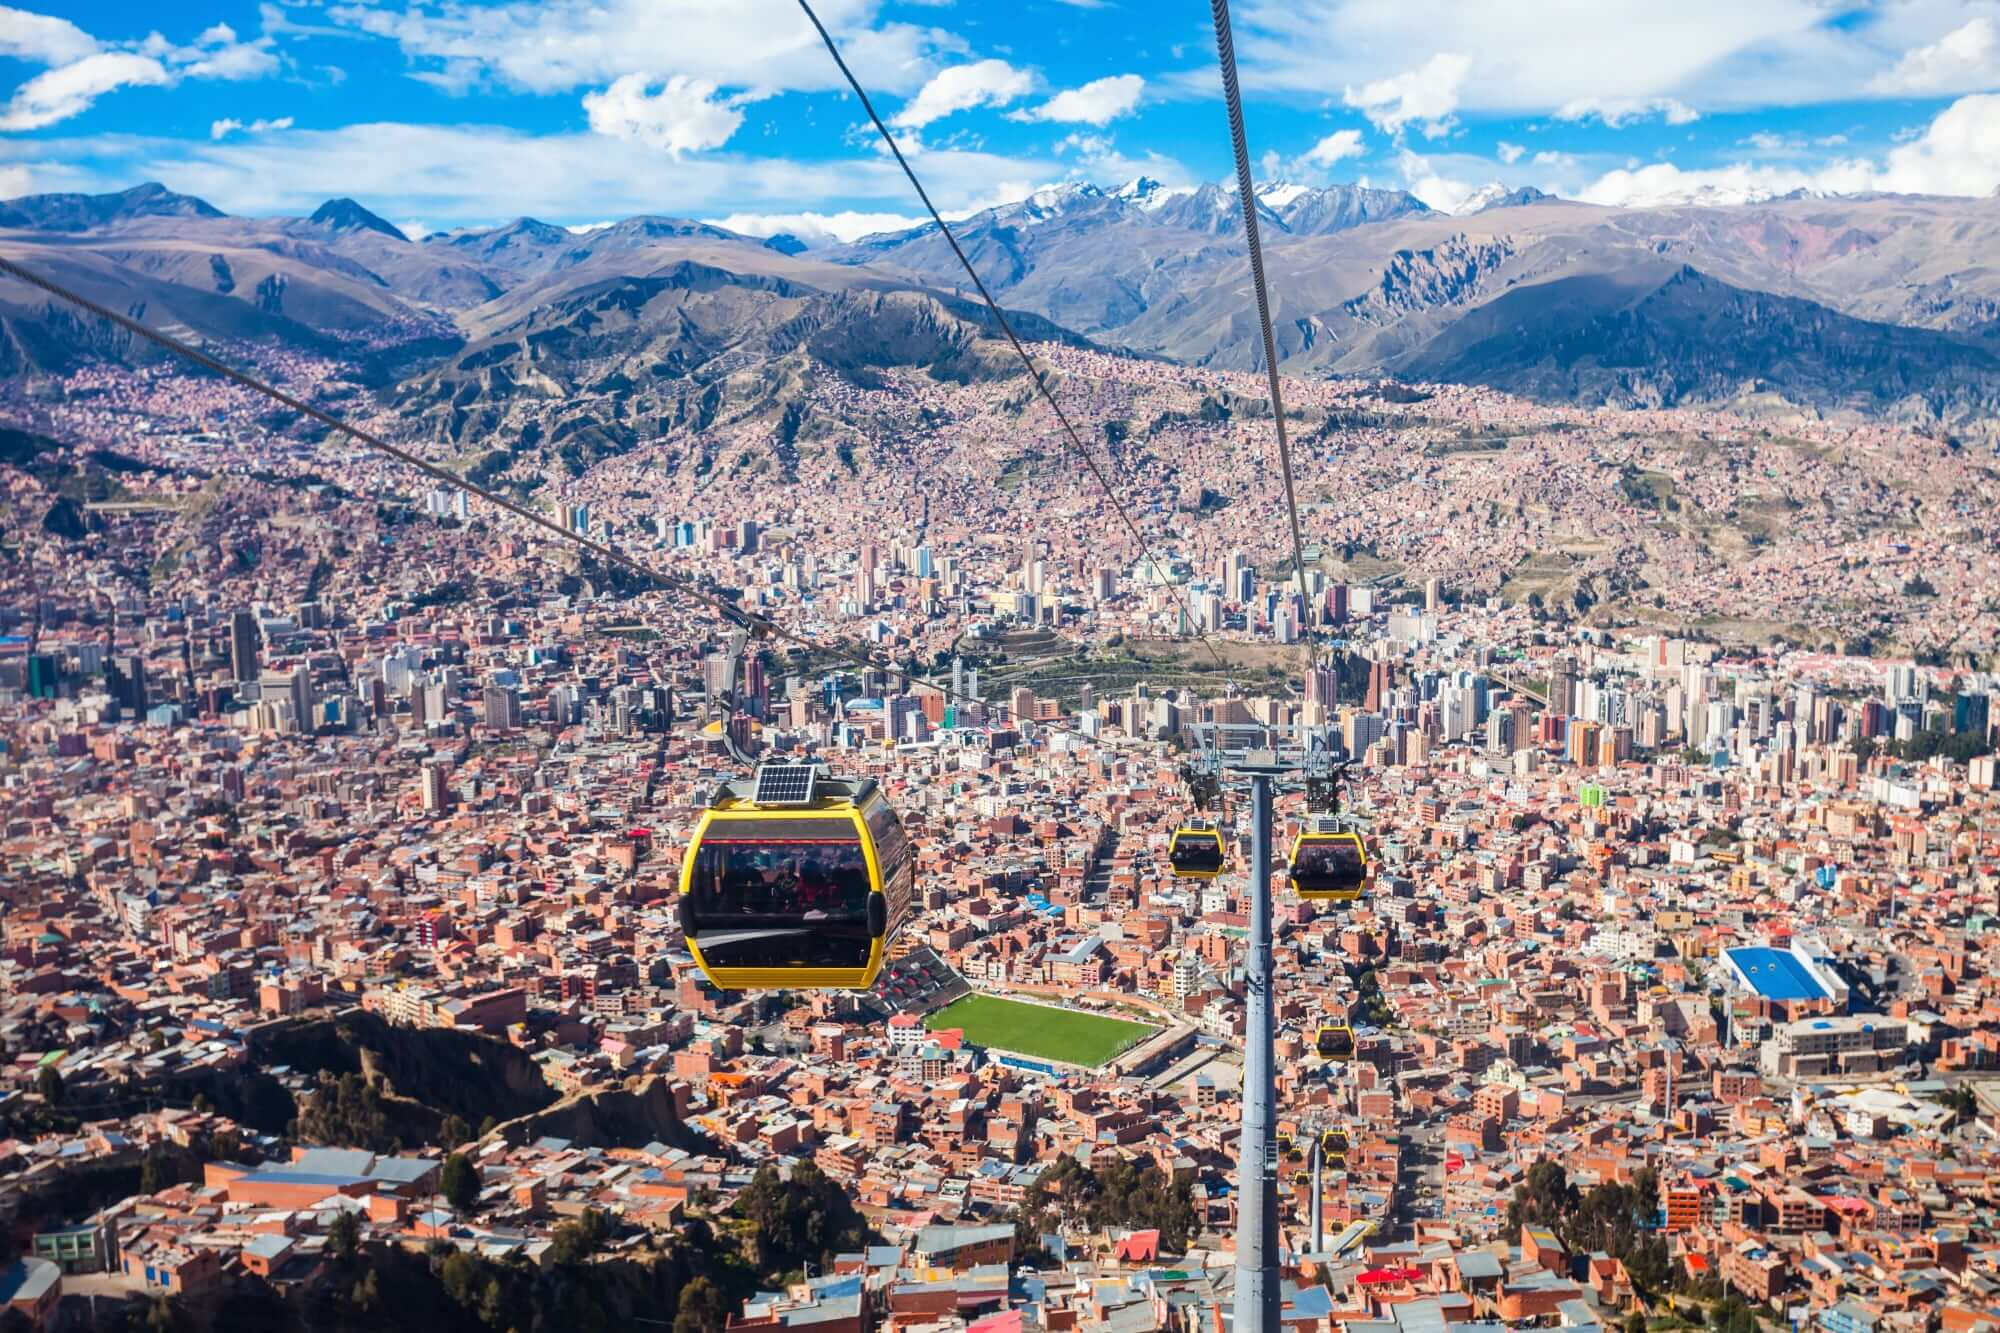 The city of La Paz, Bolivia